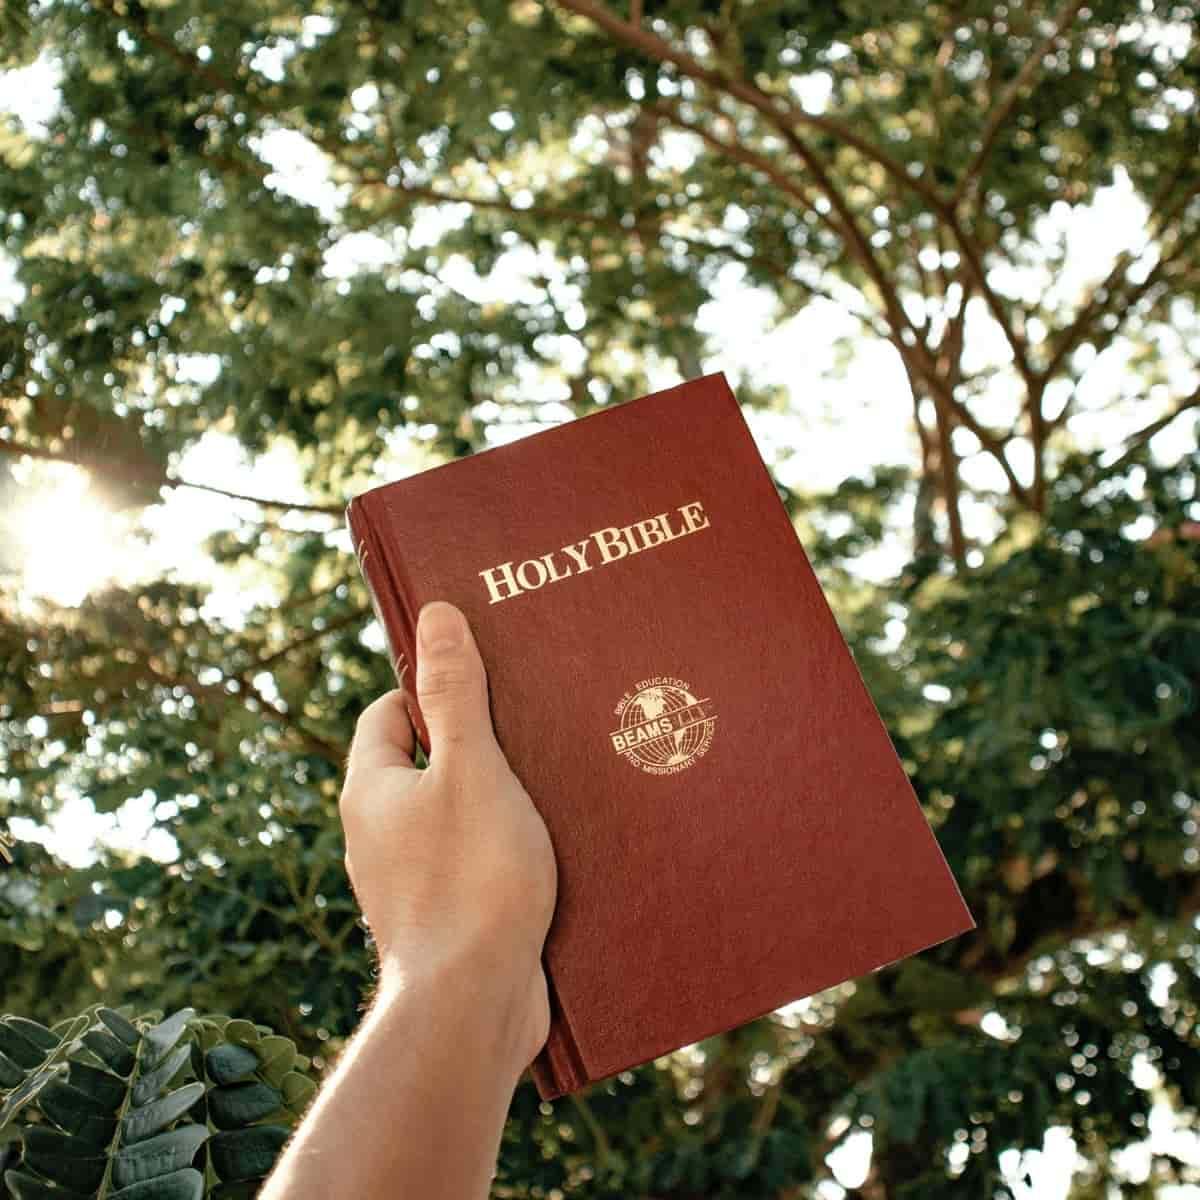 Prayer to Walk in the Holy Spirit